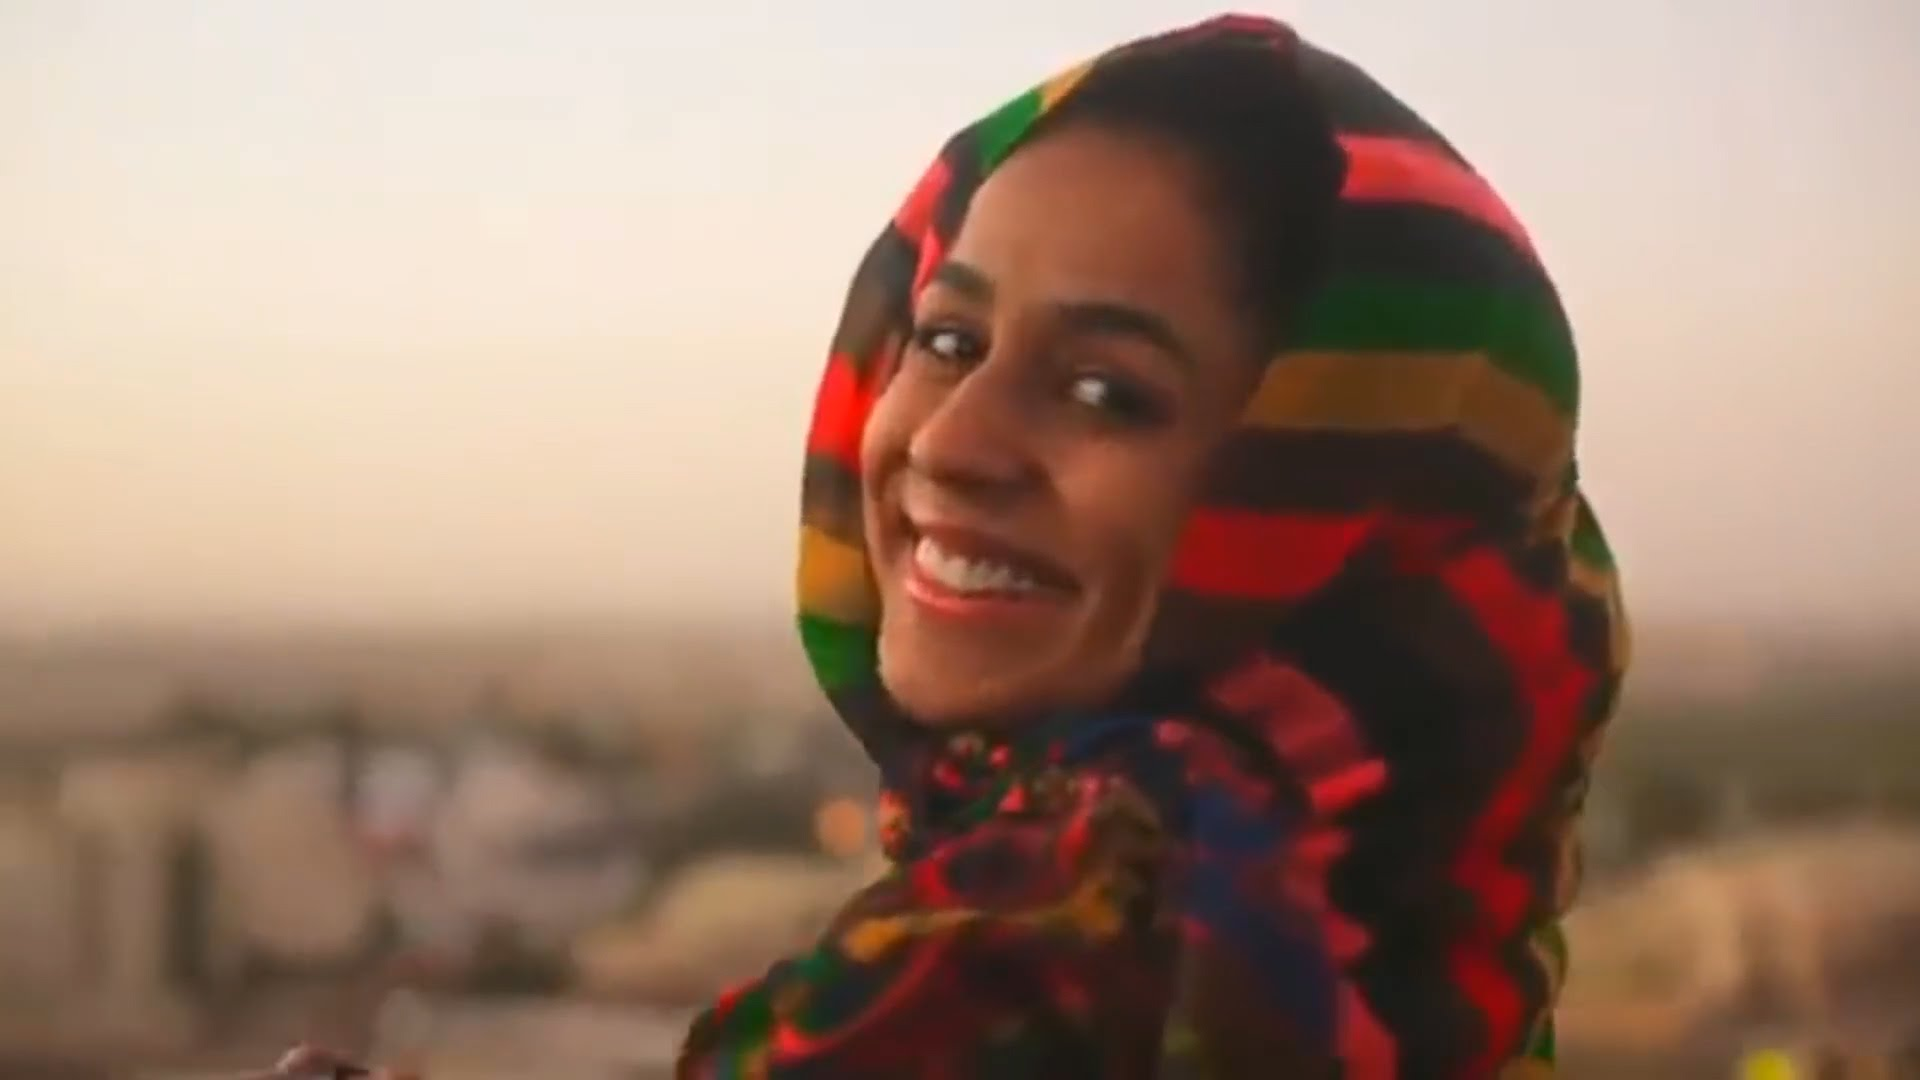 صورة اجمل سودانية , صور لبنات سودانيه جميله جدا